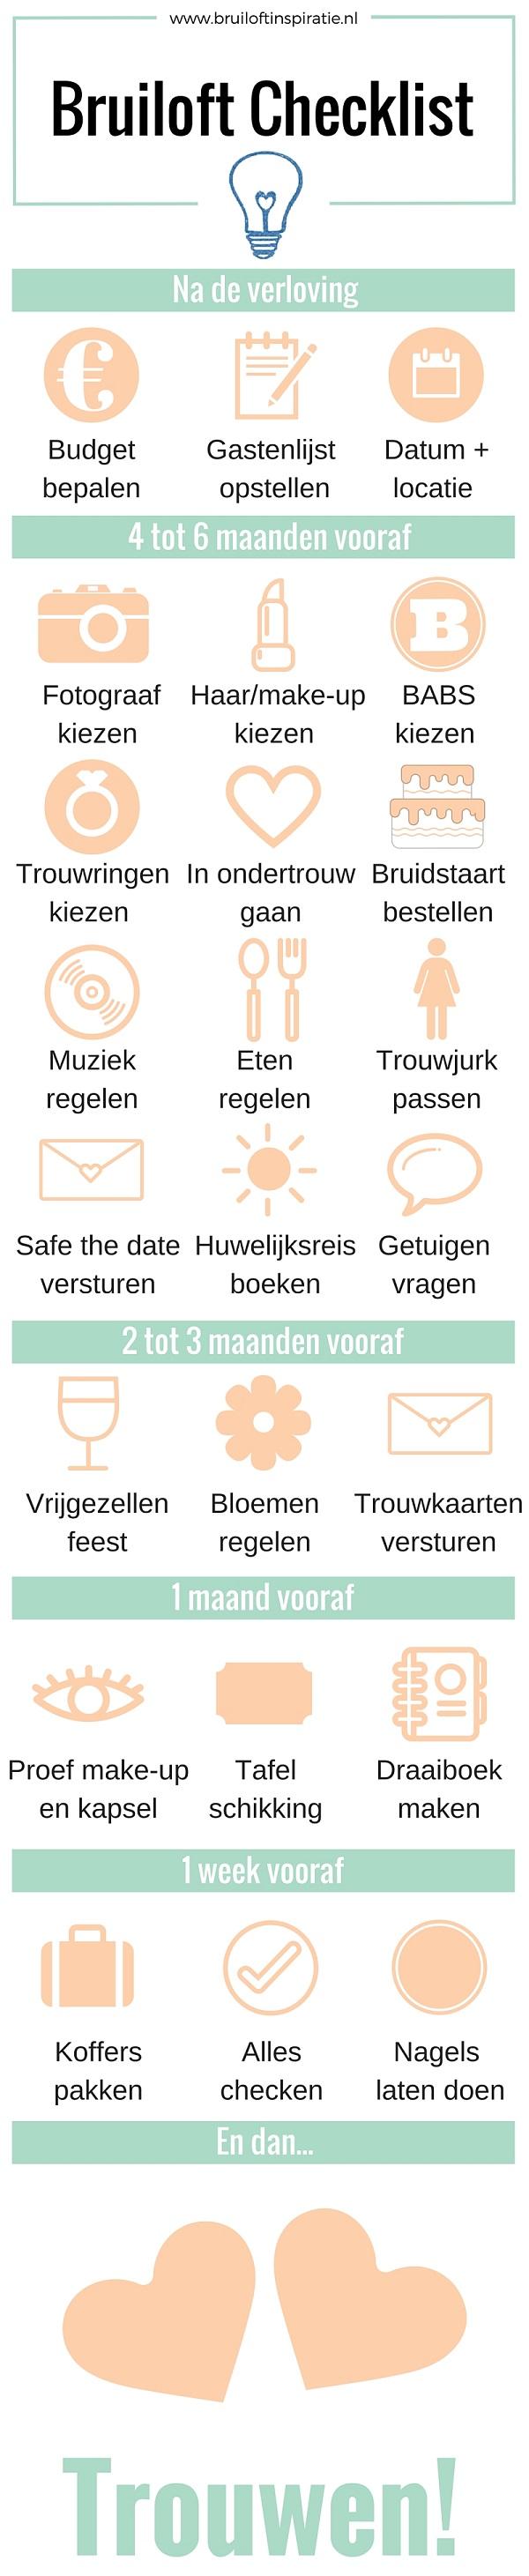 checklist bruiloft regelen